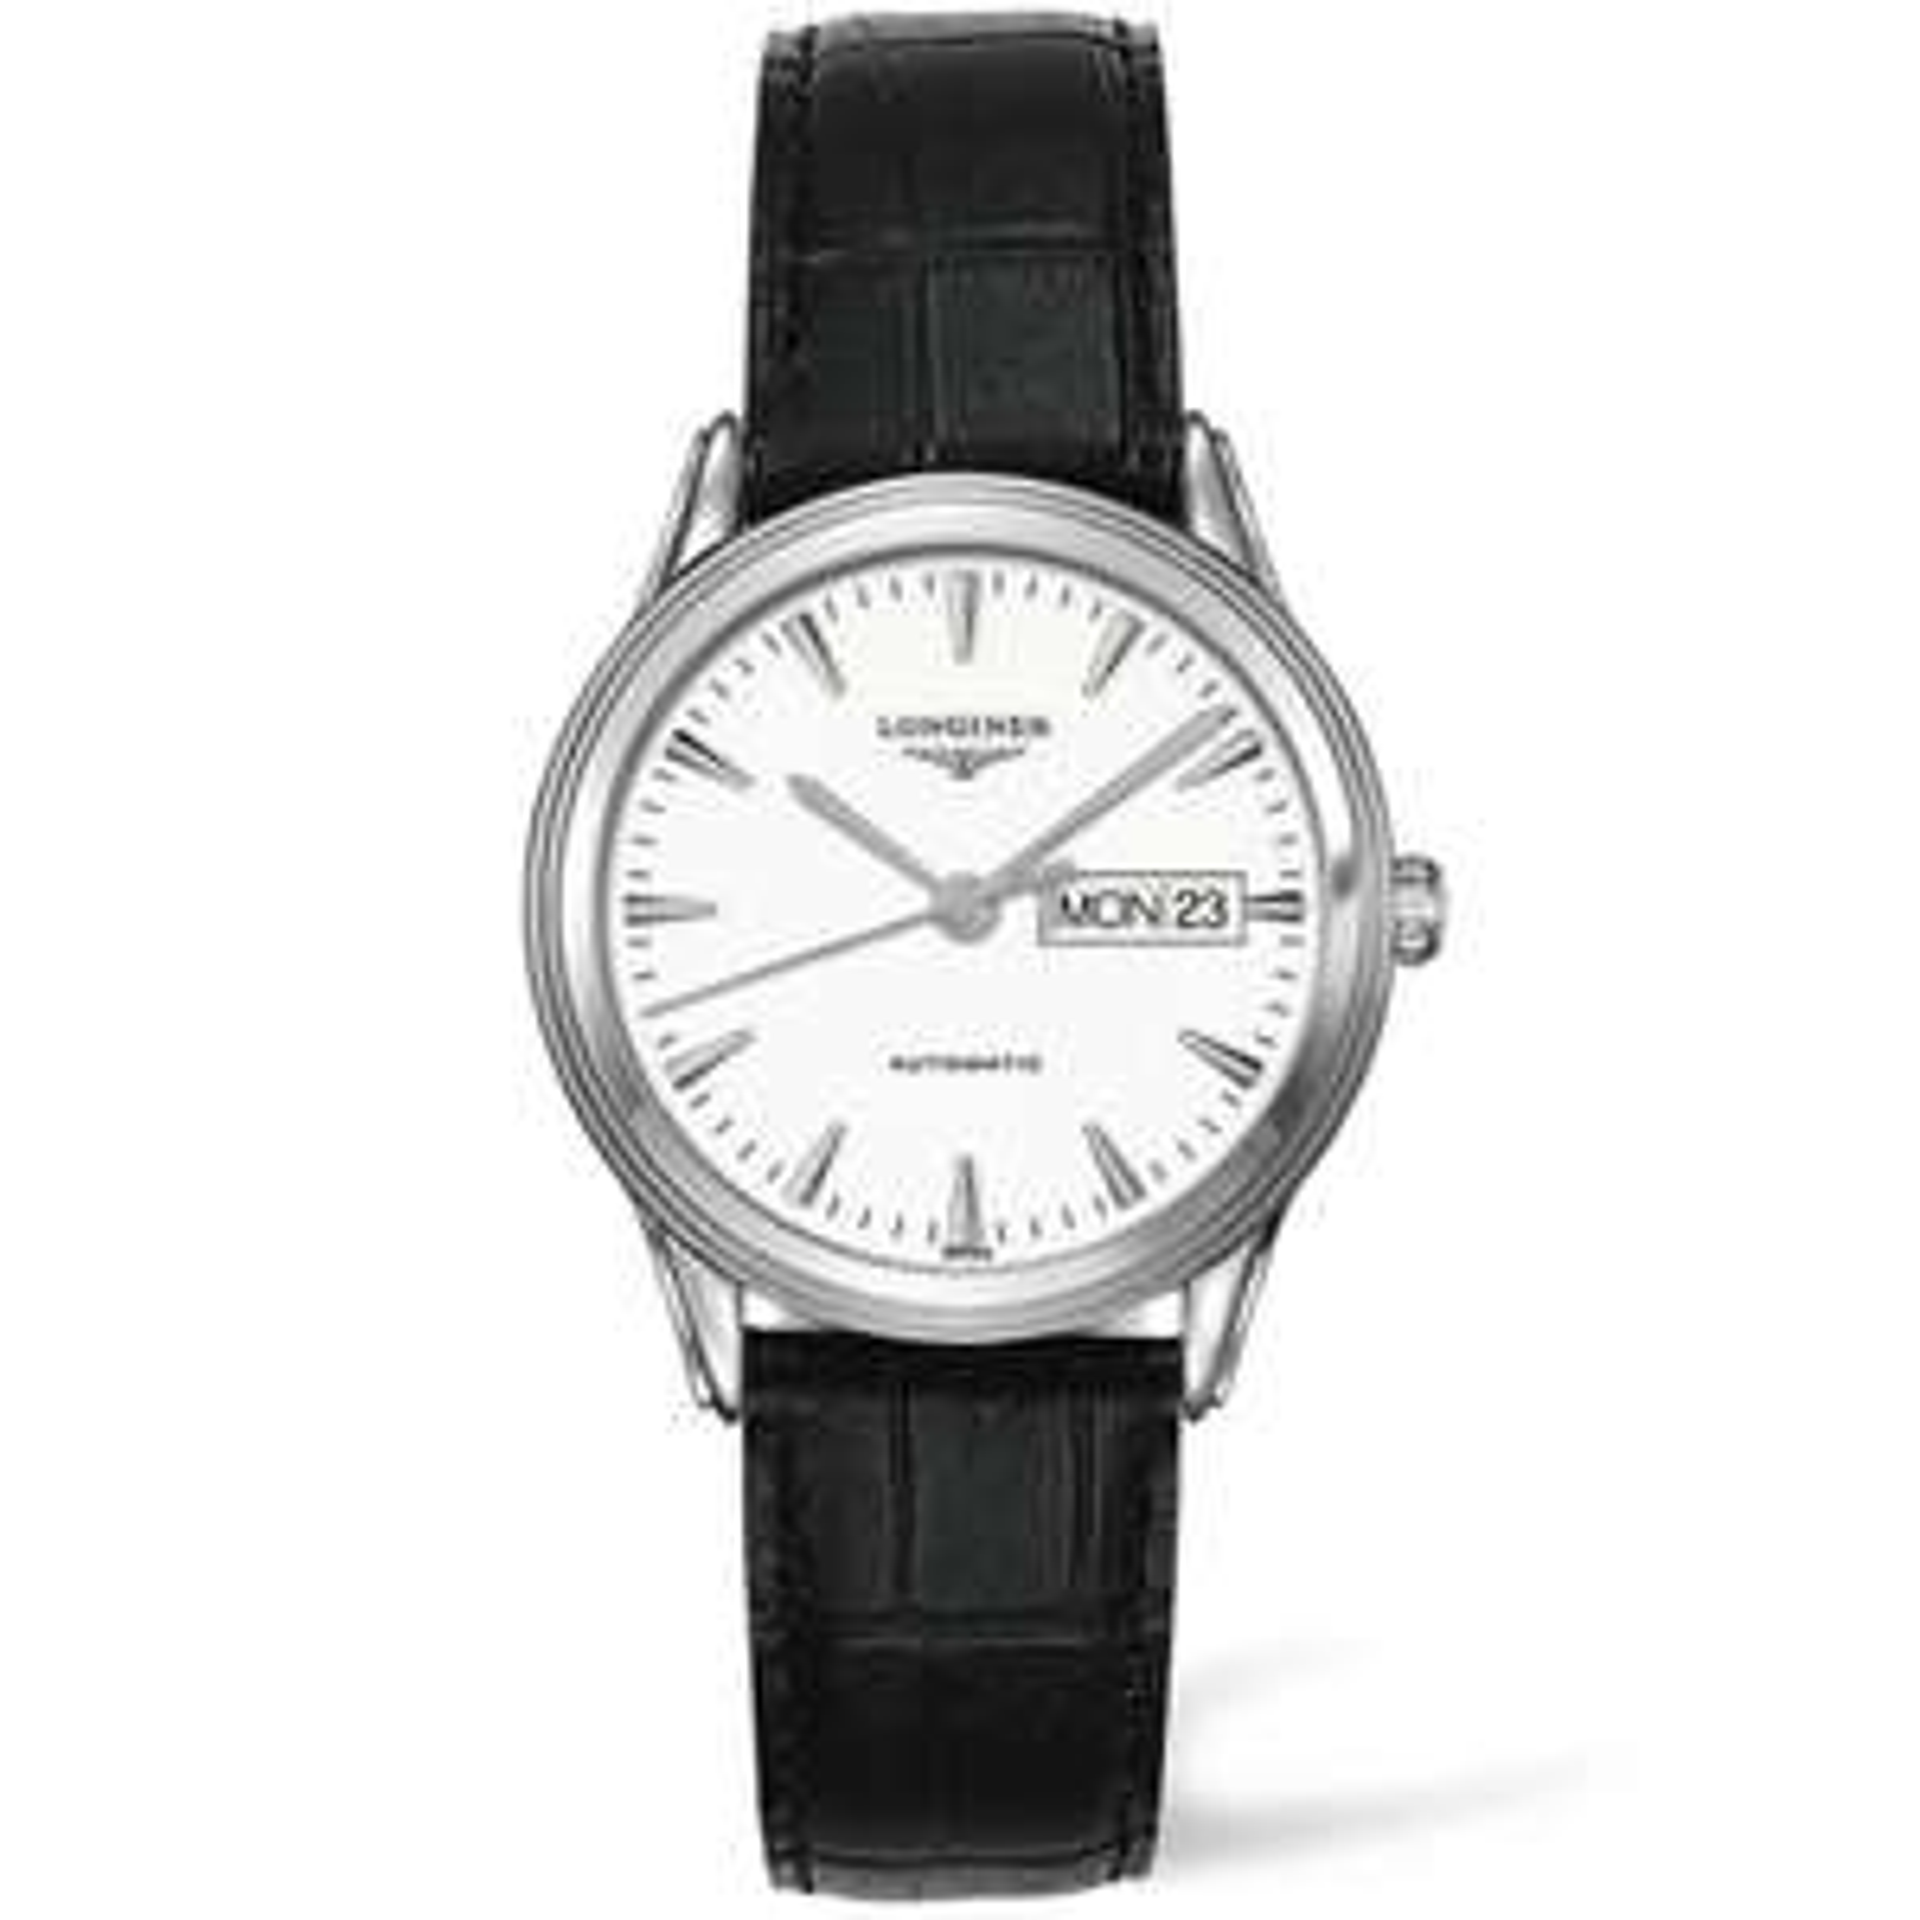 Longines Flagship men's watch - £865 @ Lister Horsfall